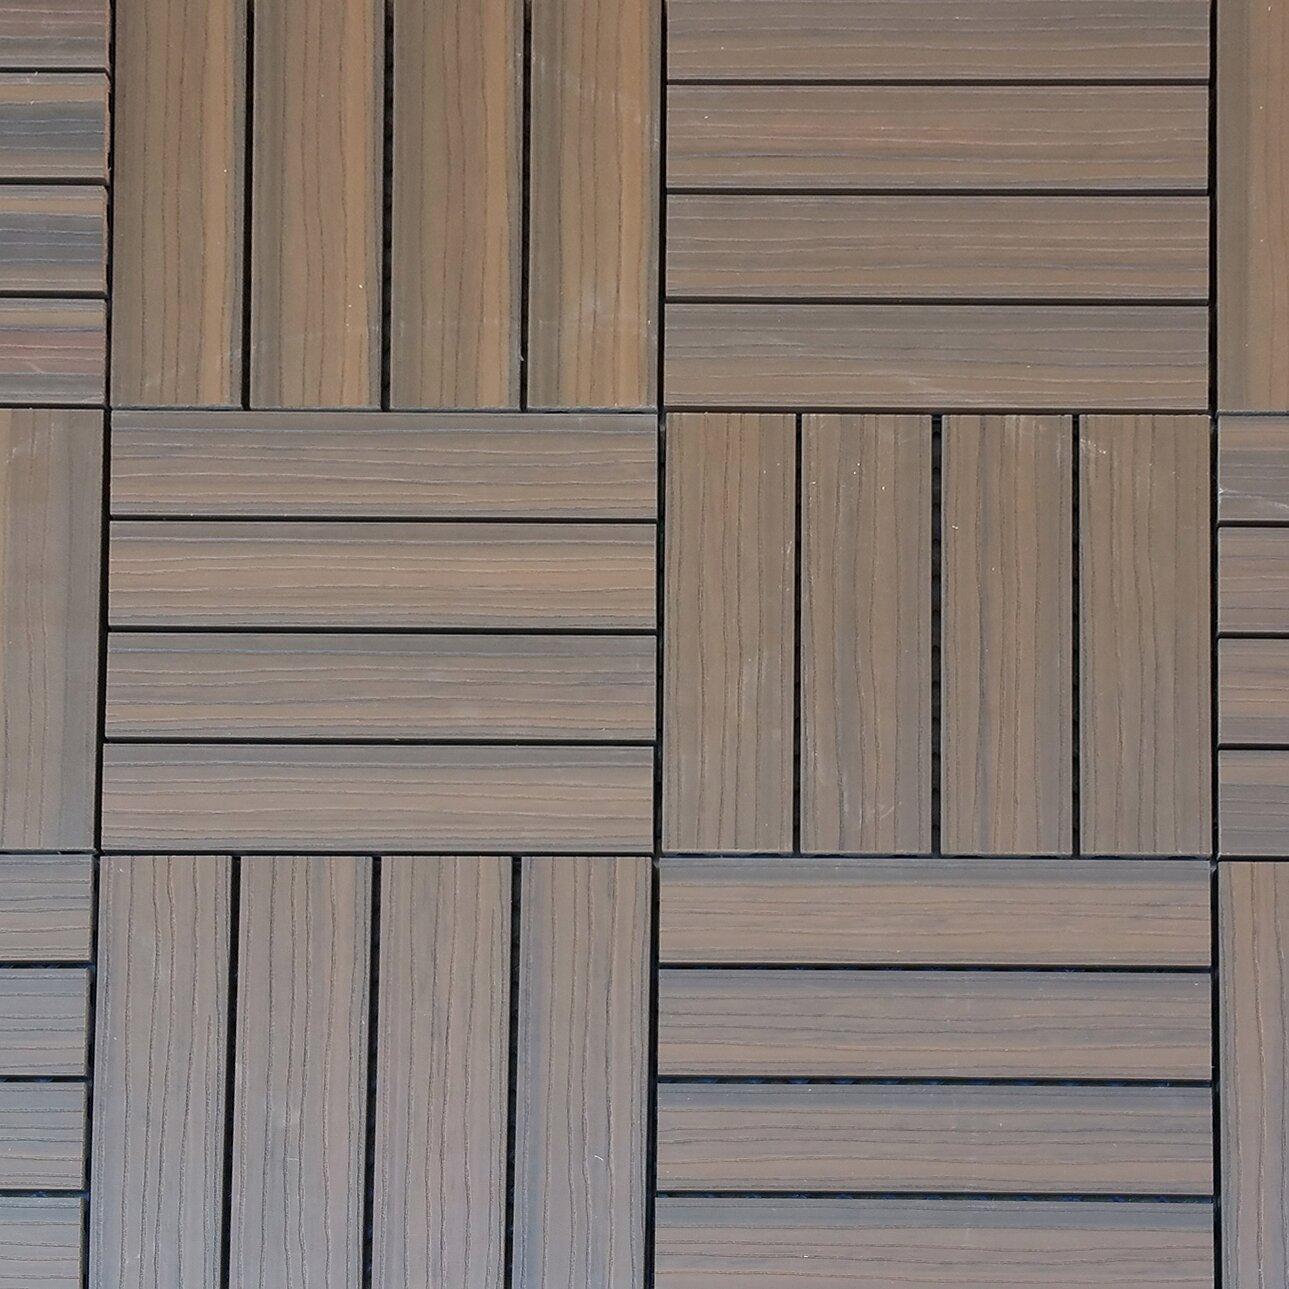 vifah composite walnut 12 x 12 interlocking deck tiles. Black Bedroom Furniture Sets. Home Design Ideas